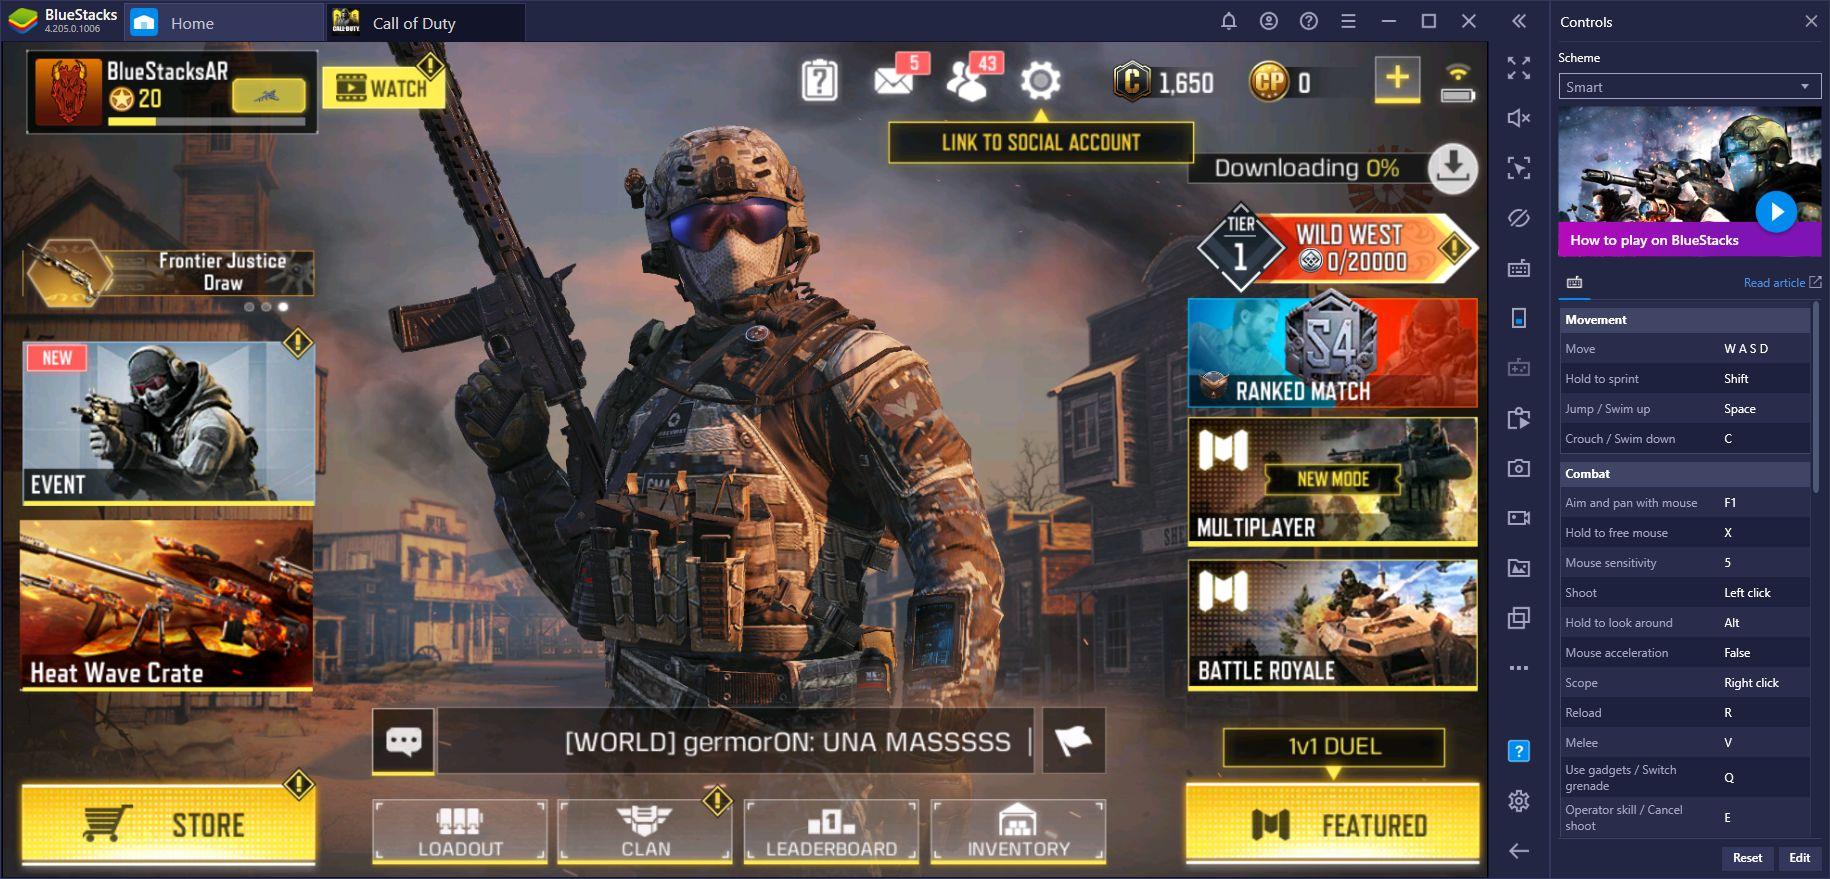 BlueStacks Pro